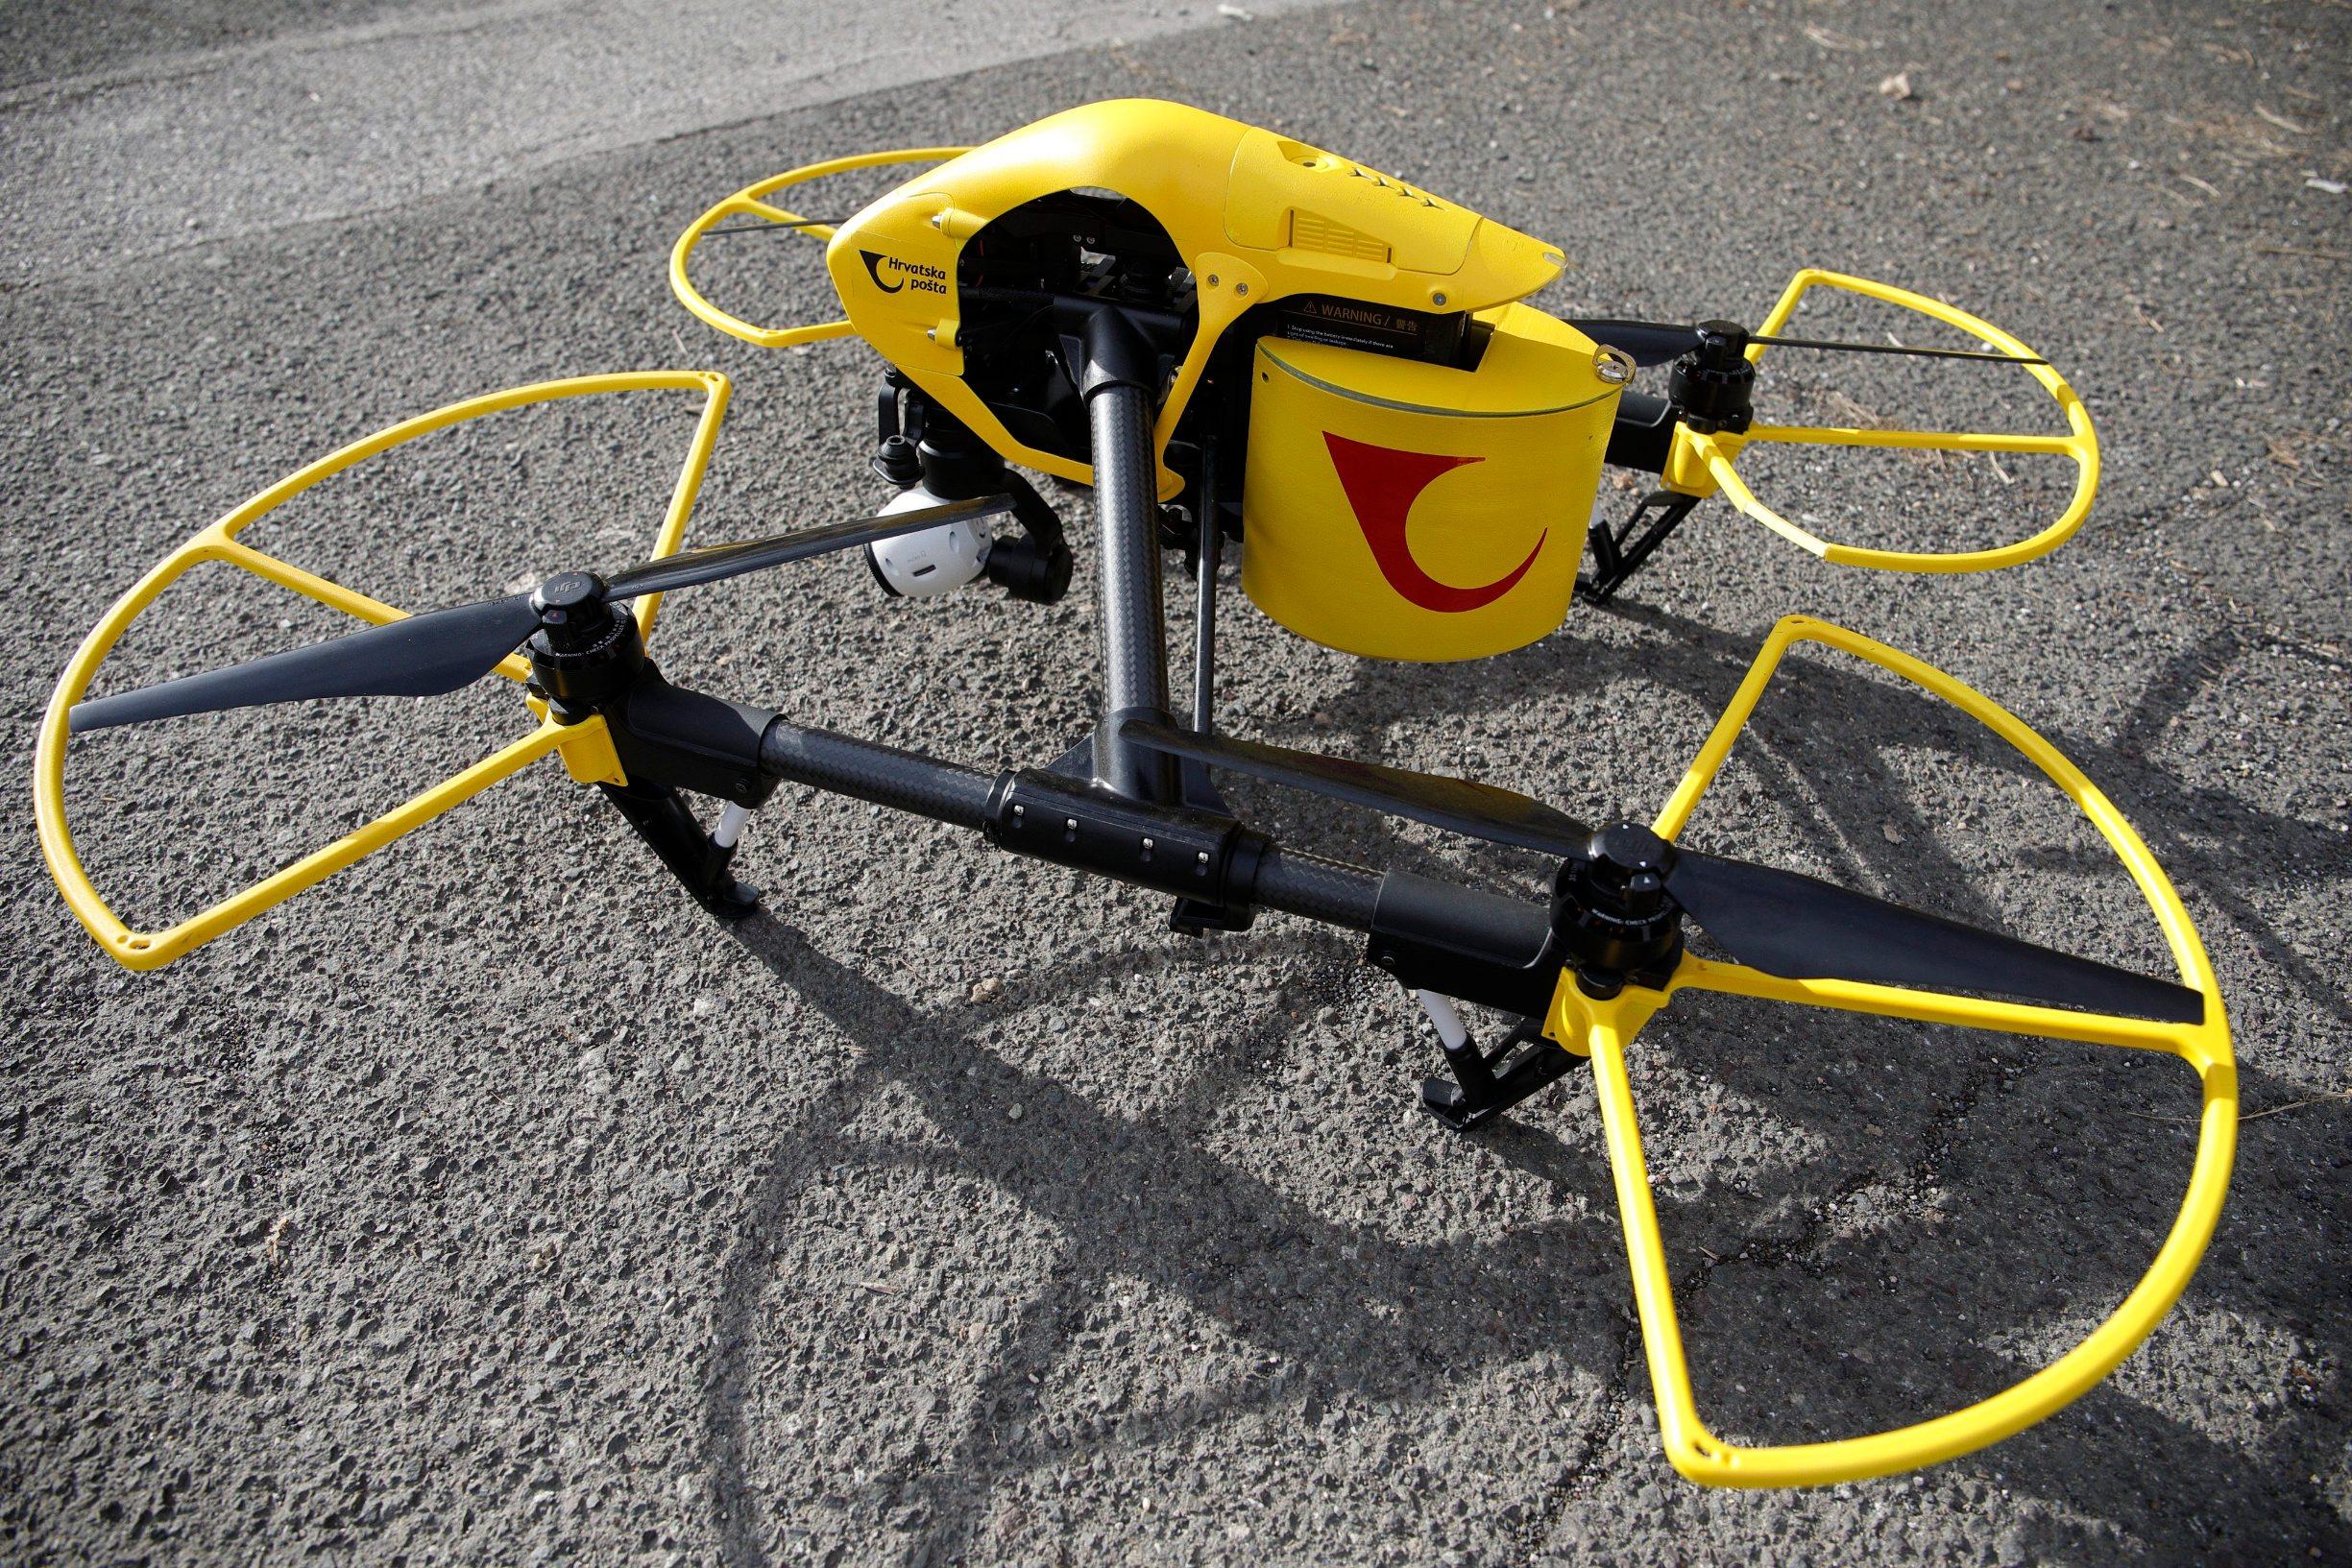 Zagreb, 210120. Tvrtka AIR-RMLD dostavila je postu dronom iz Zadra na otok Ugljan. Na fotografiji: dron s logom Hrvatska posta. Foto: Dragan Matic / CROPIX